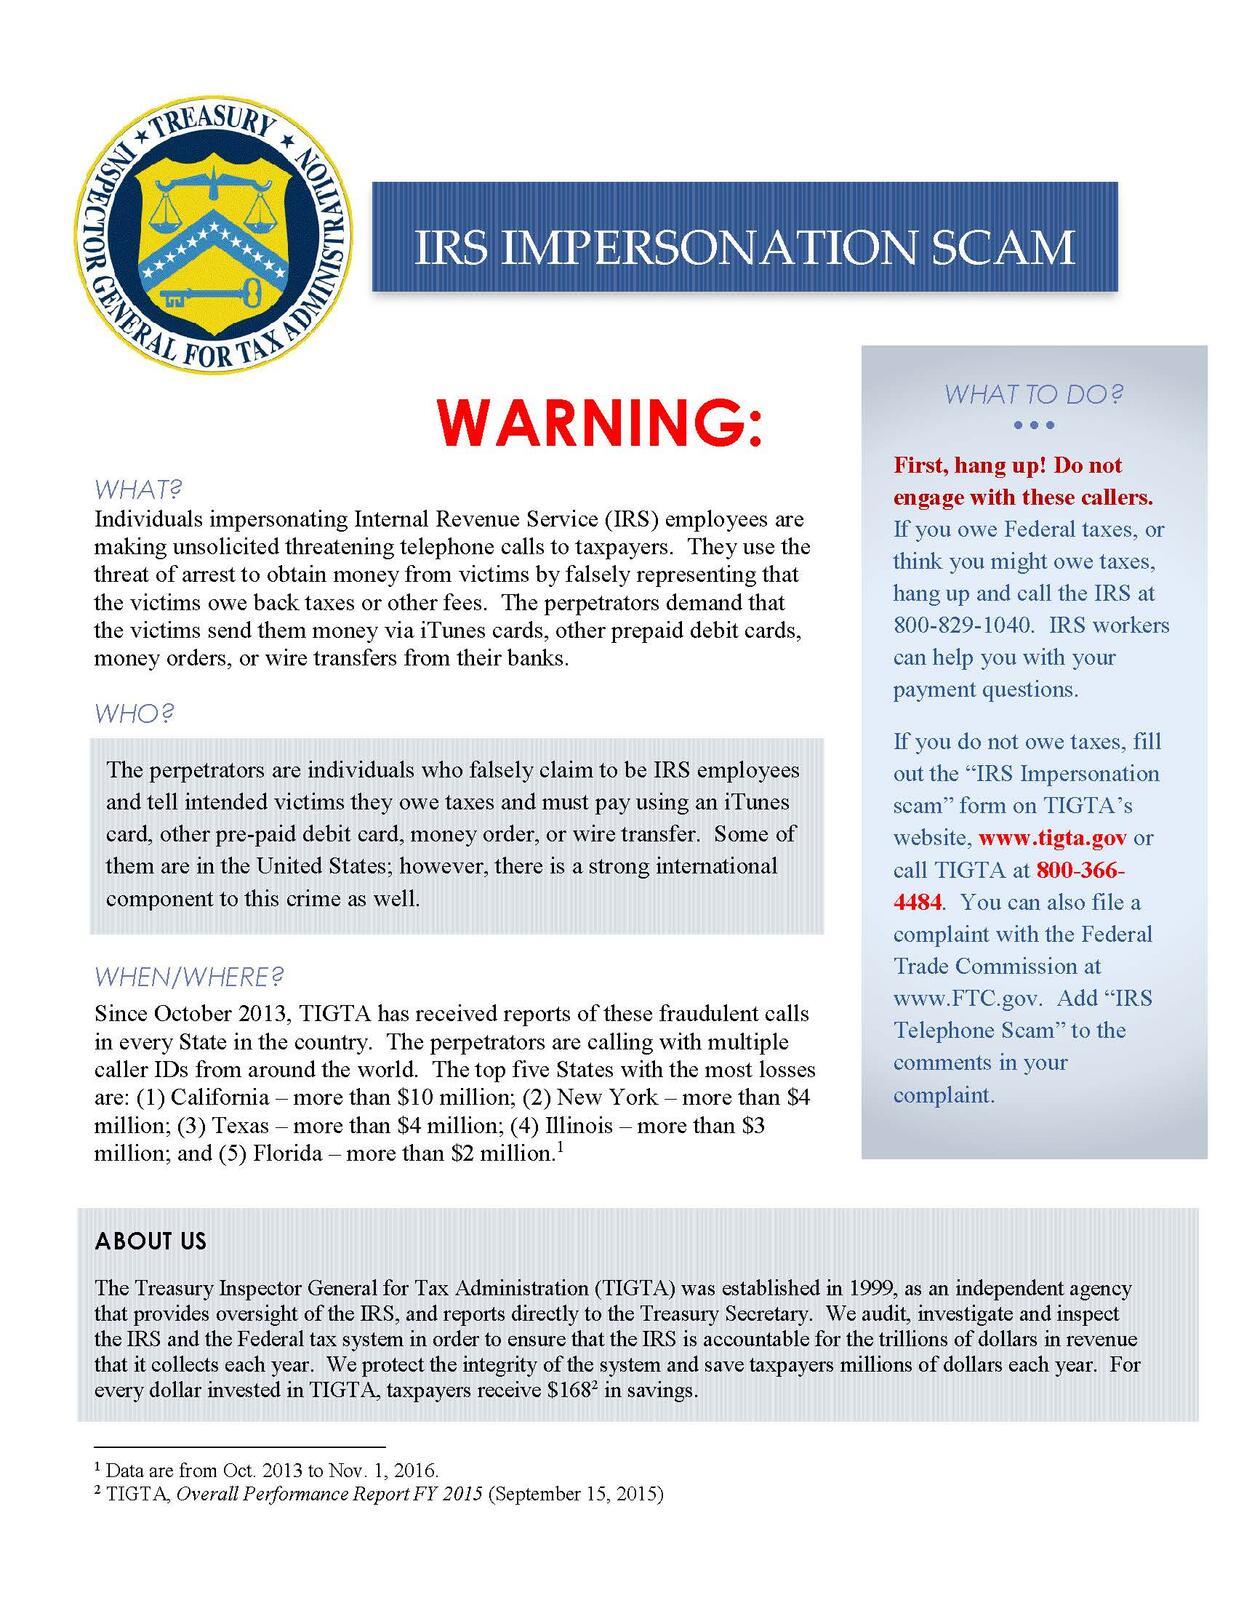 IRS IMPERSONATION SCAM (Fort Worth Police Department) | Nextdoor